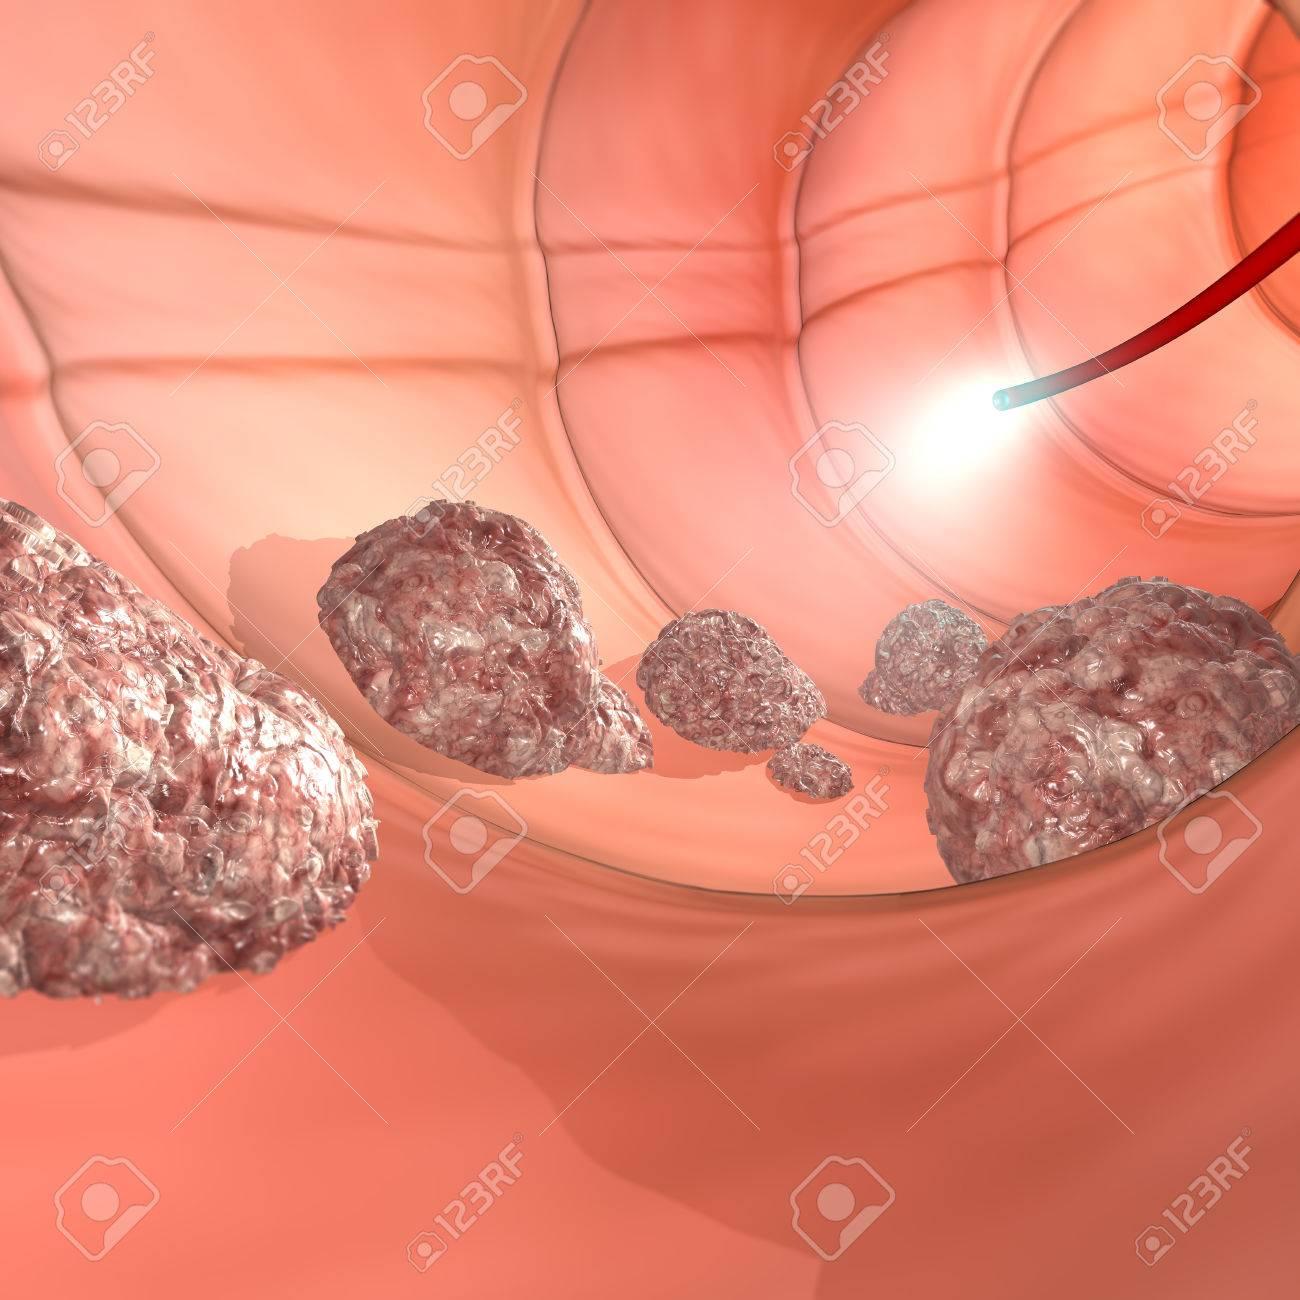 Colonoscopy examination colon digestive system Stock Photo - 28837459